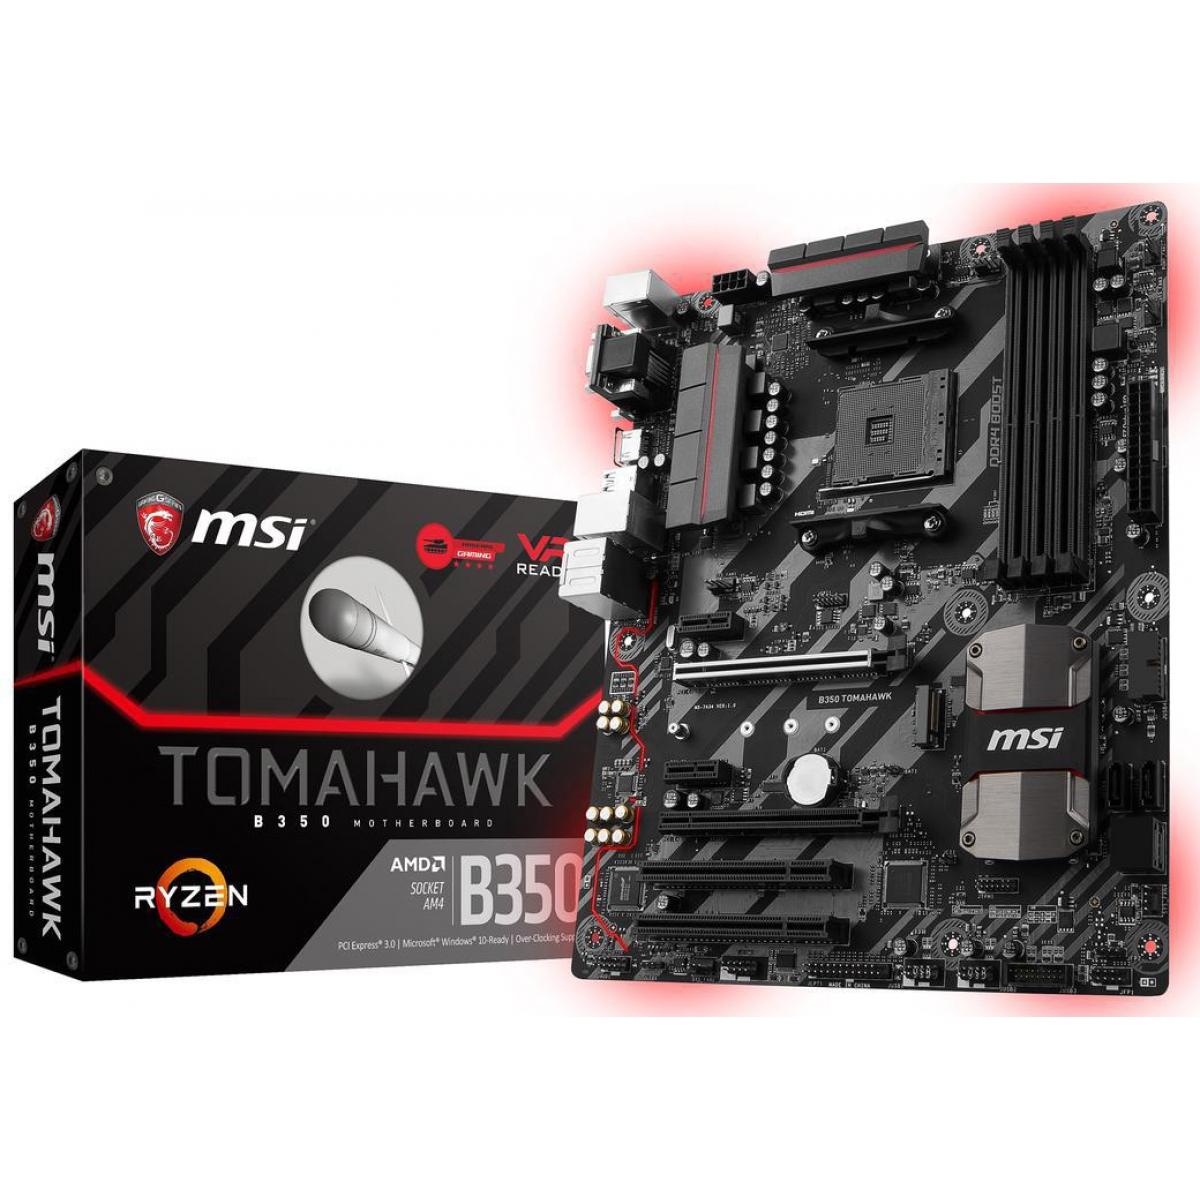 Placa Mãe MSI B350 Tomahawk, Chipset B350, AMD AM4, ATX, DDR4